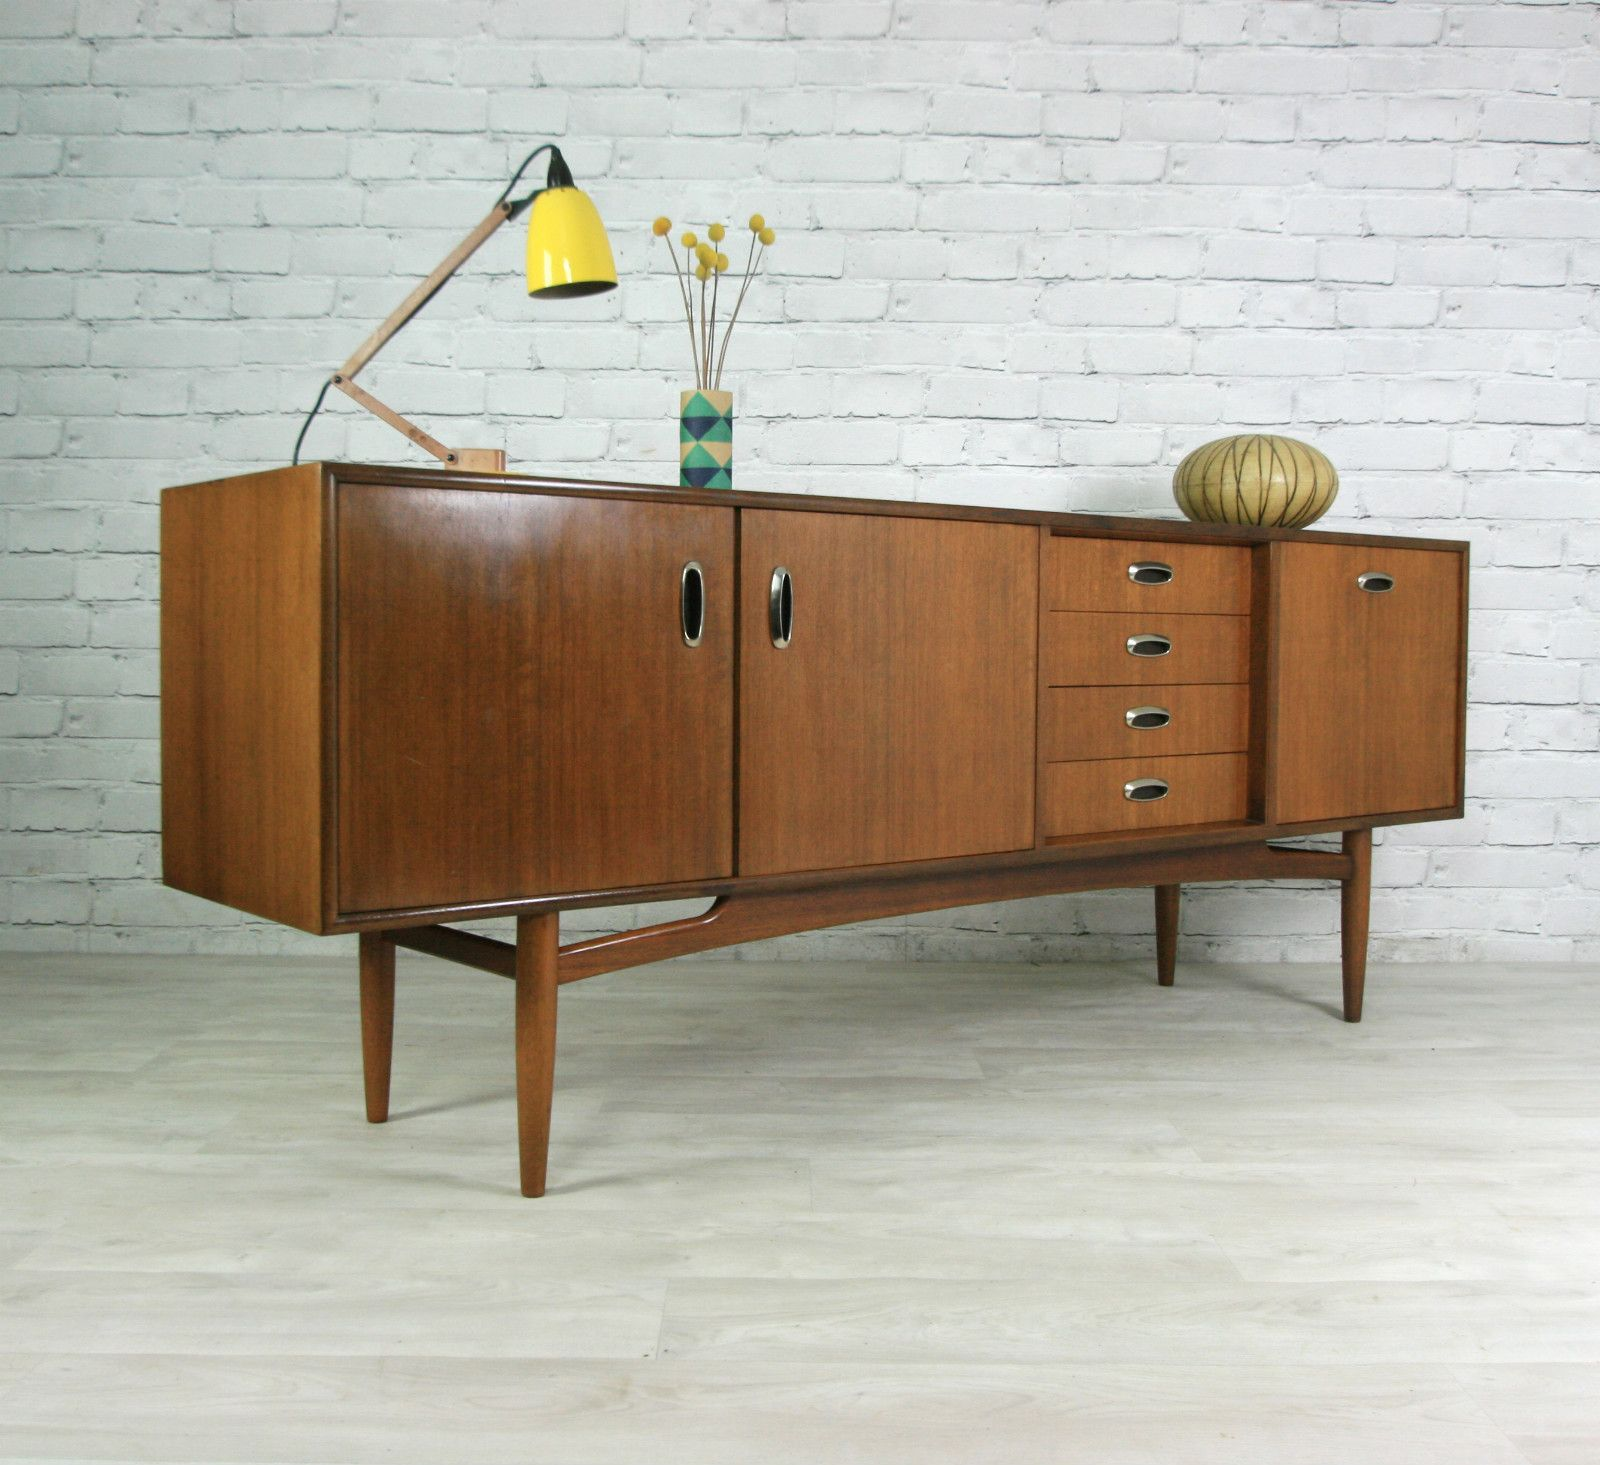 G Plan Retro Vintage Teak Mid Century Danish Style Sideboard Eames Era 50s 60s Ebay Retro Furniture Contemporary Home Decor Home Decor